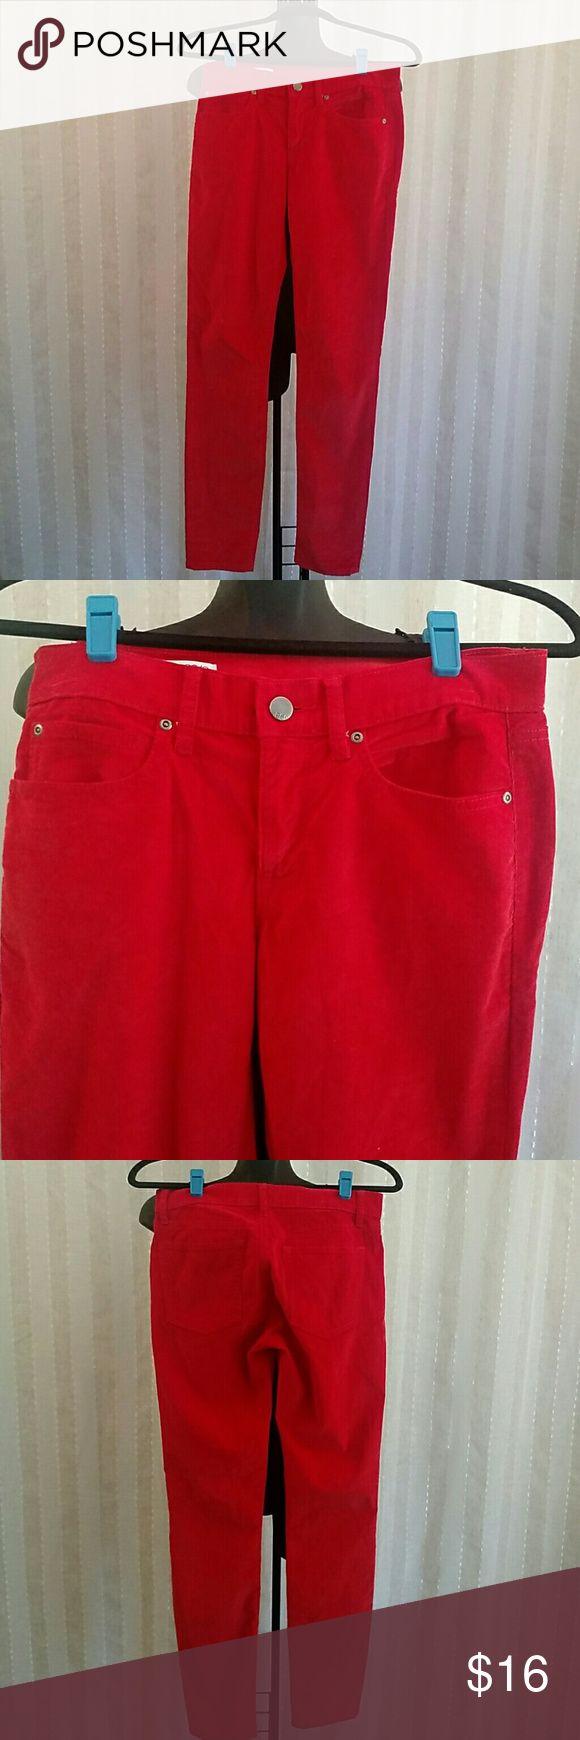 Gap 1969 legging Jean Red corduroy, legging jeans style, size 26 regular, button front closure, lightly loved GAP Pants